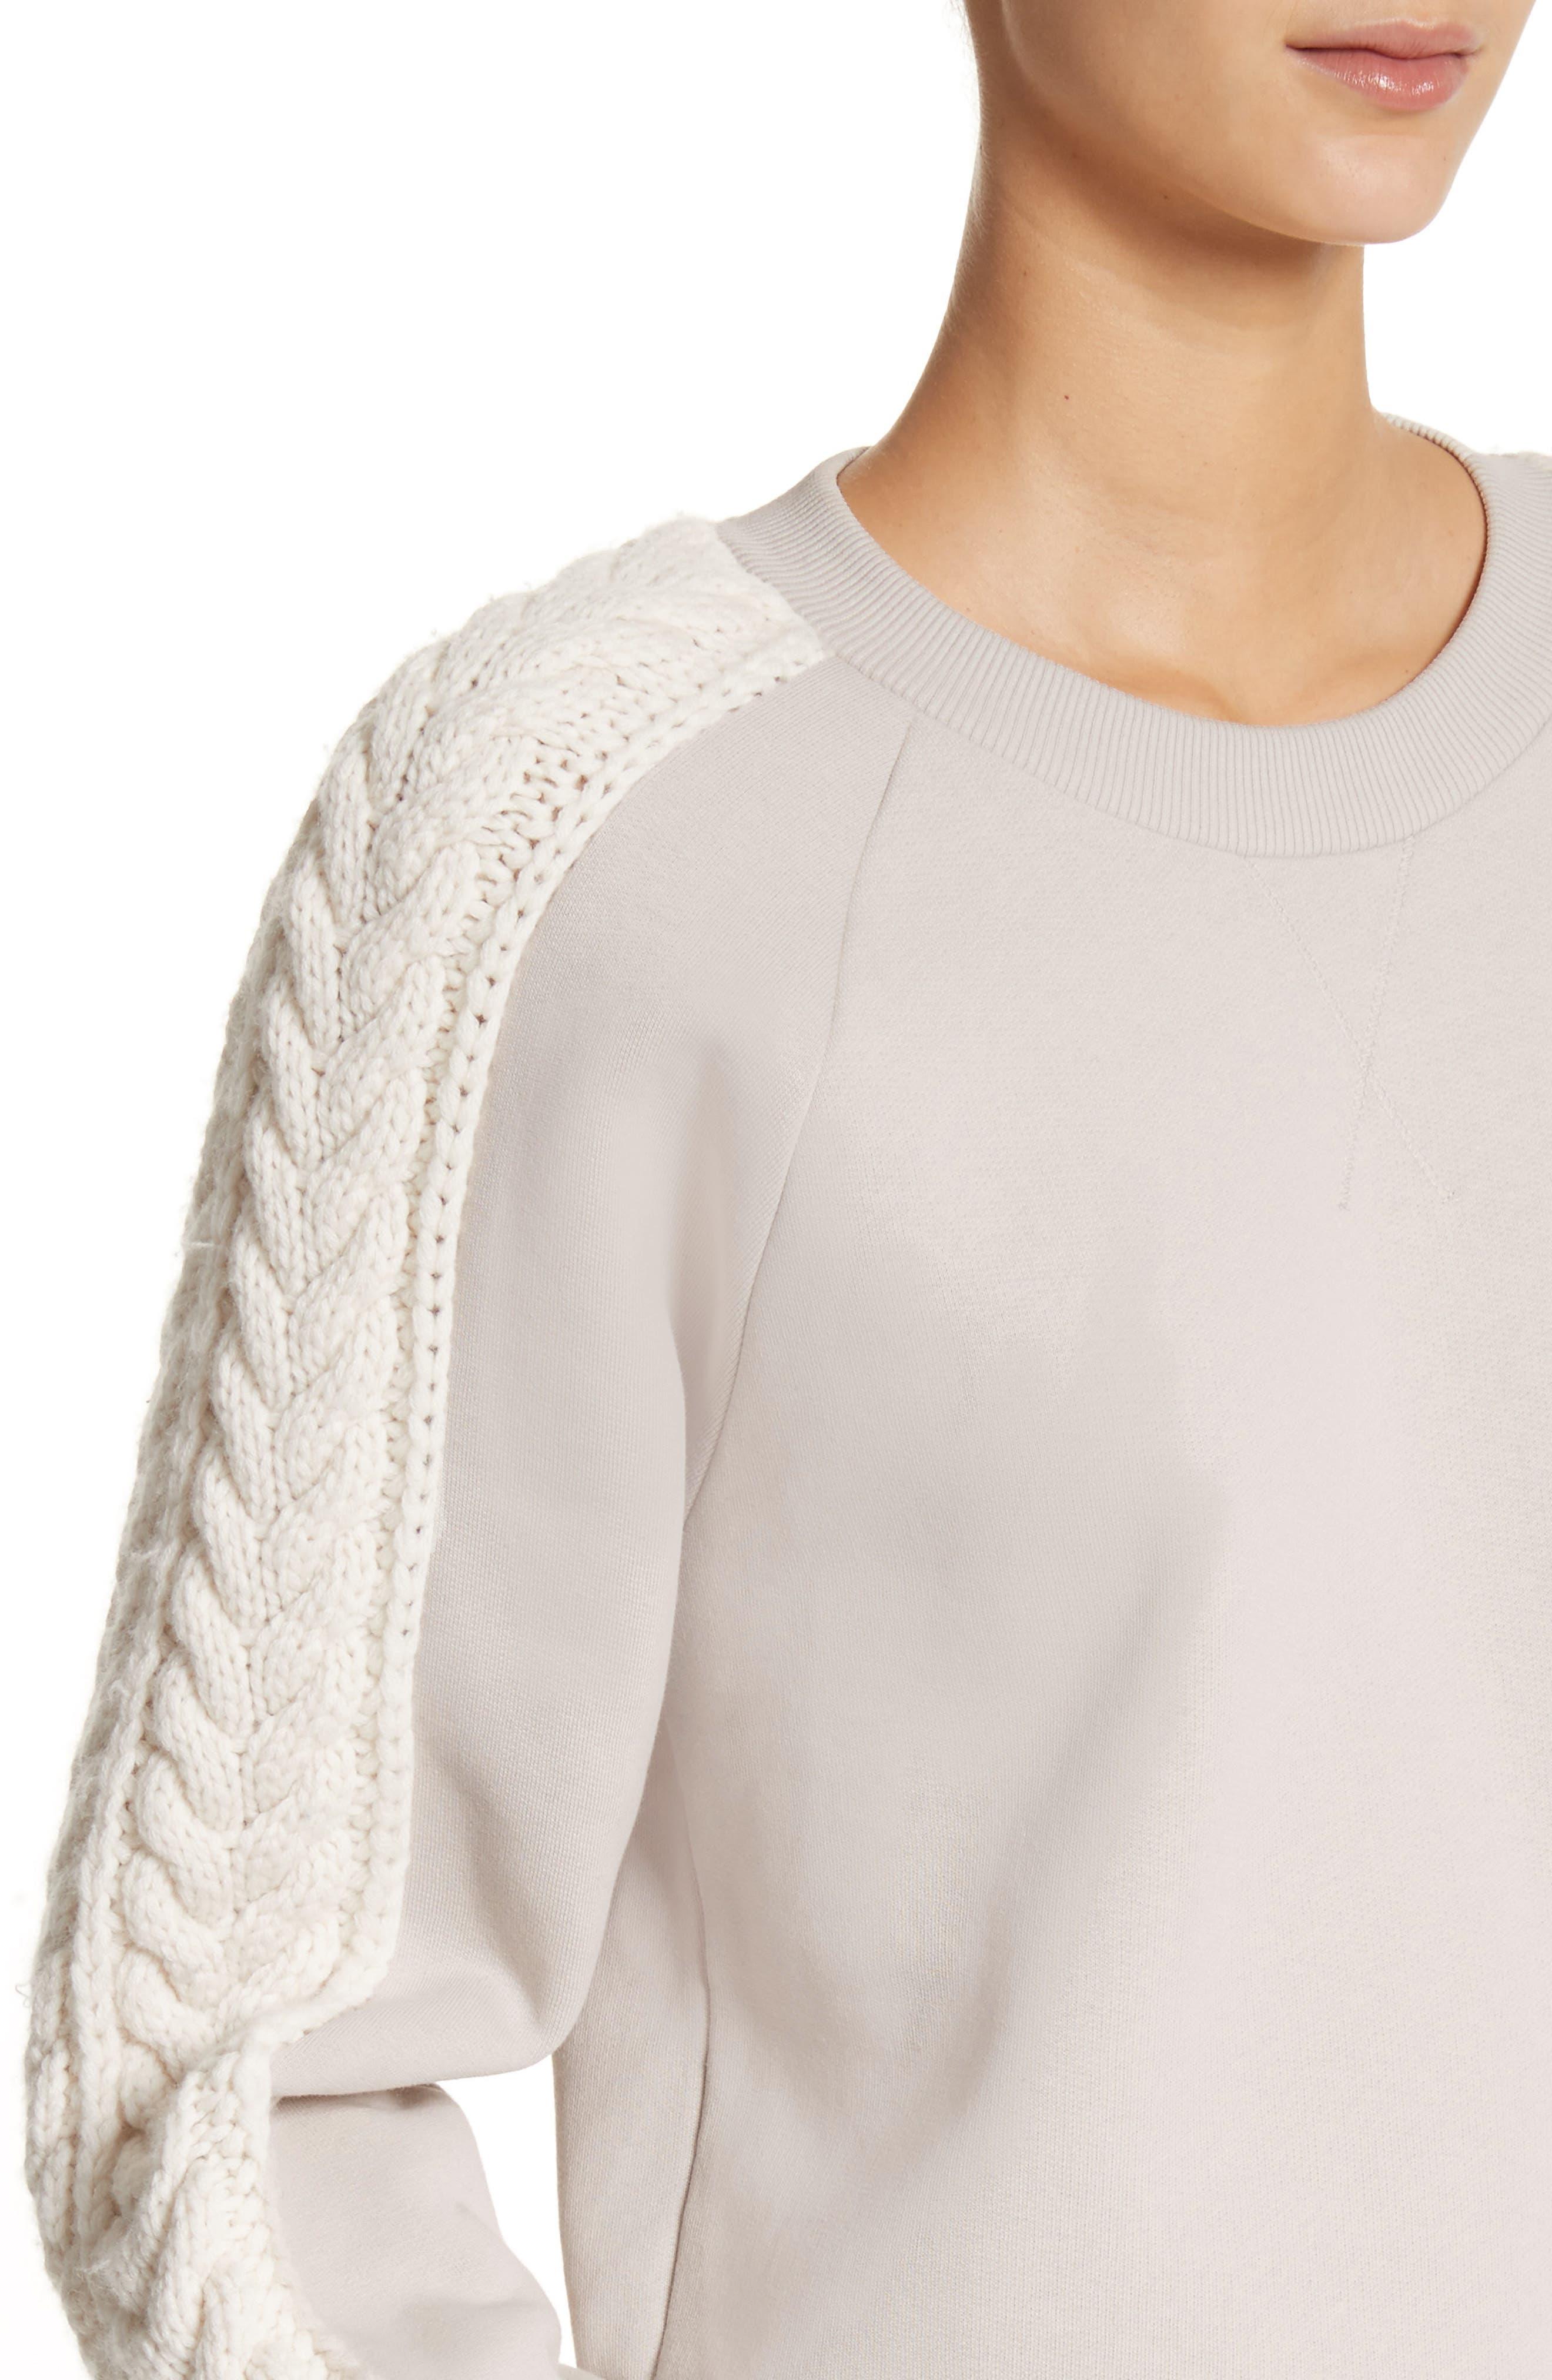 Selho Sweatshirt,                             Alternate thumbnail 4, color,                             106